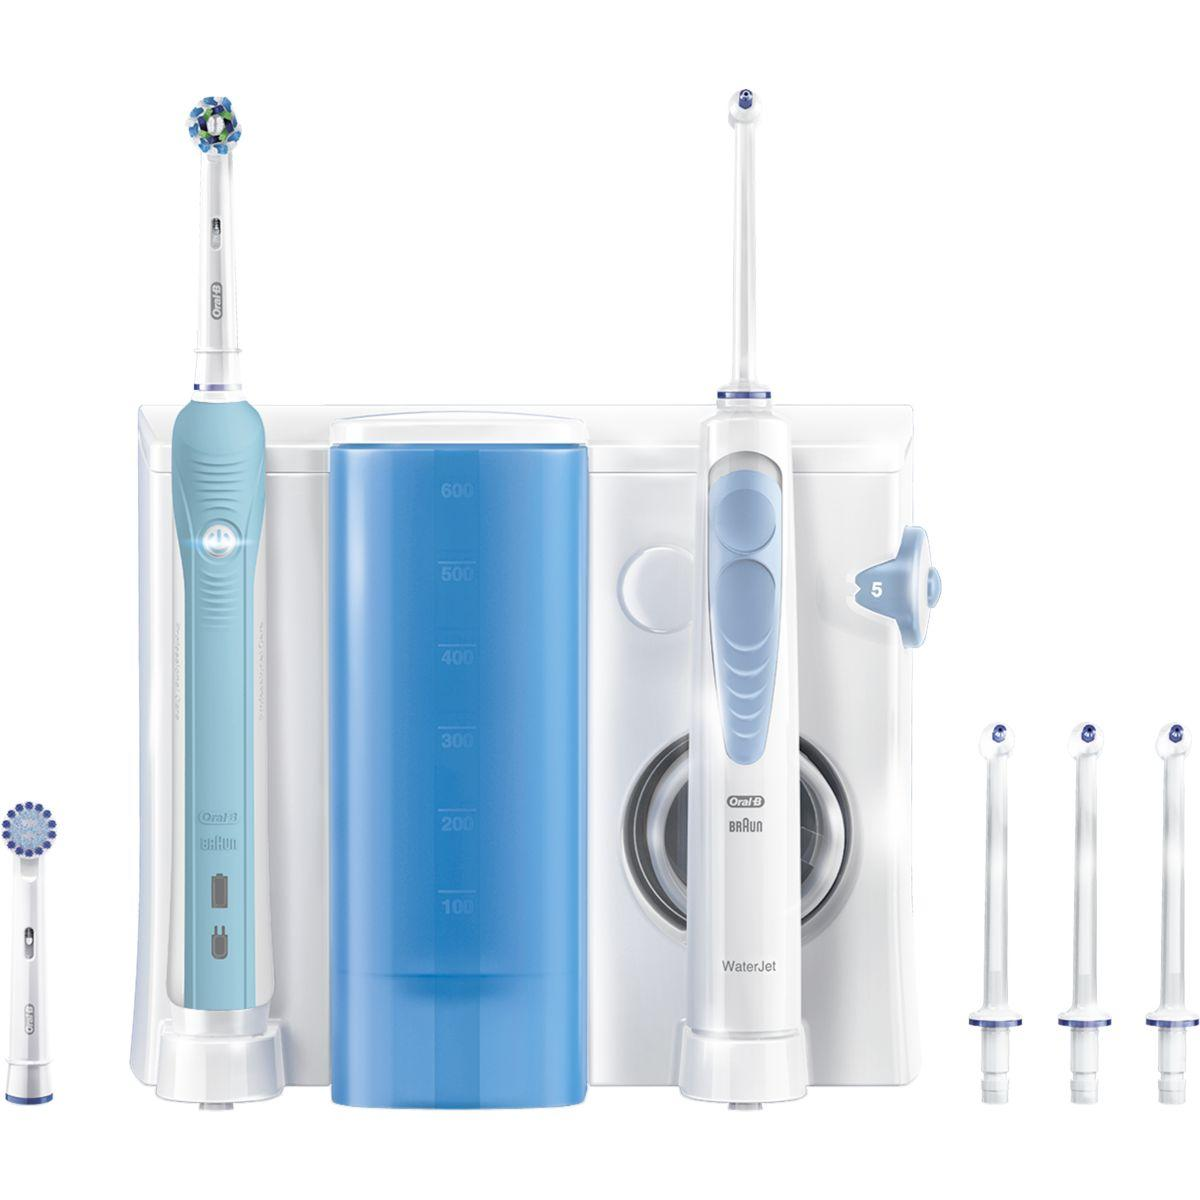 Brosse � dents oral-b oral b waterjet oc 700 cro - livraison offerte : code liv (photo)